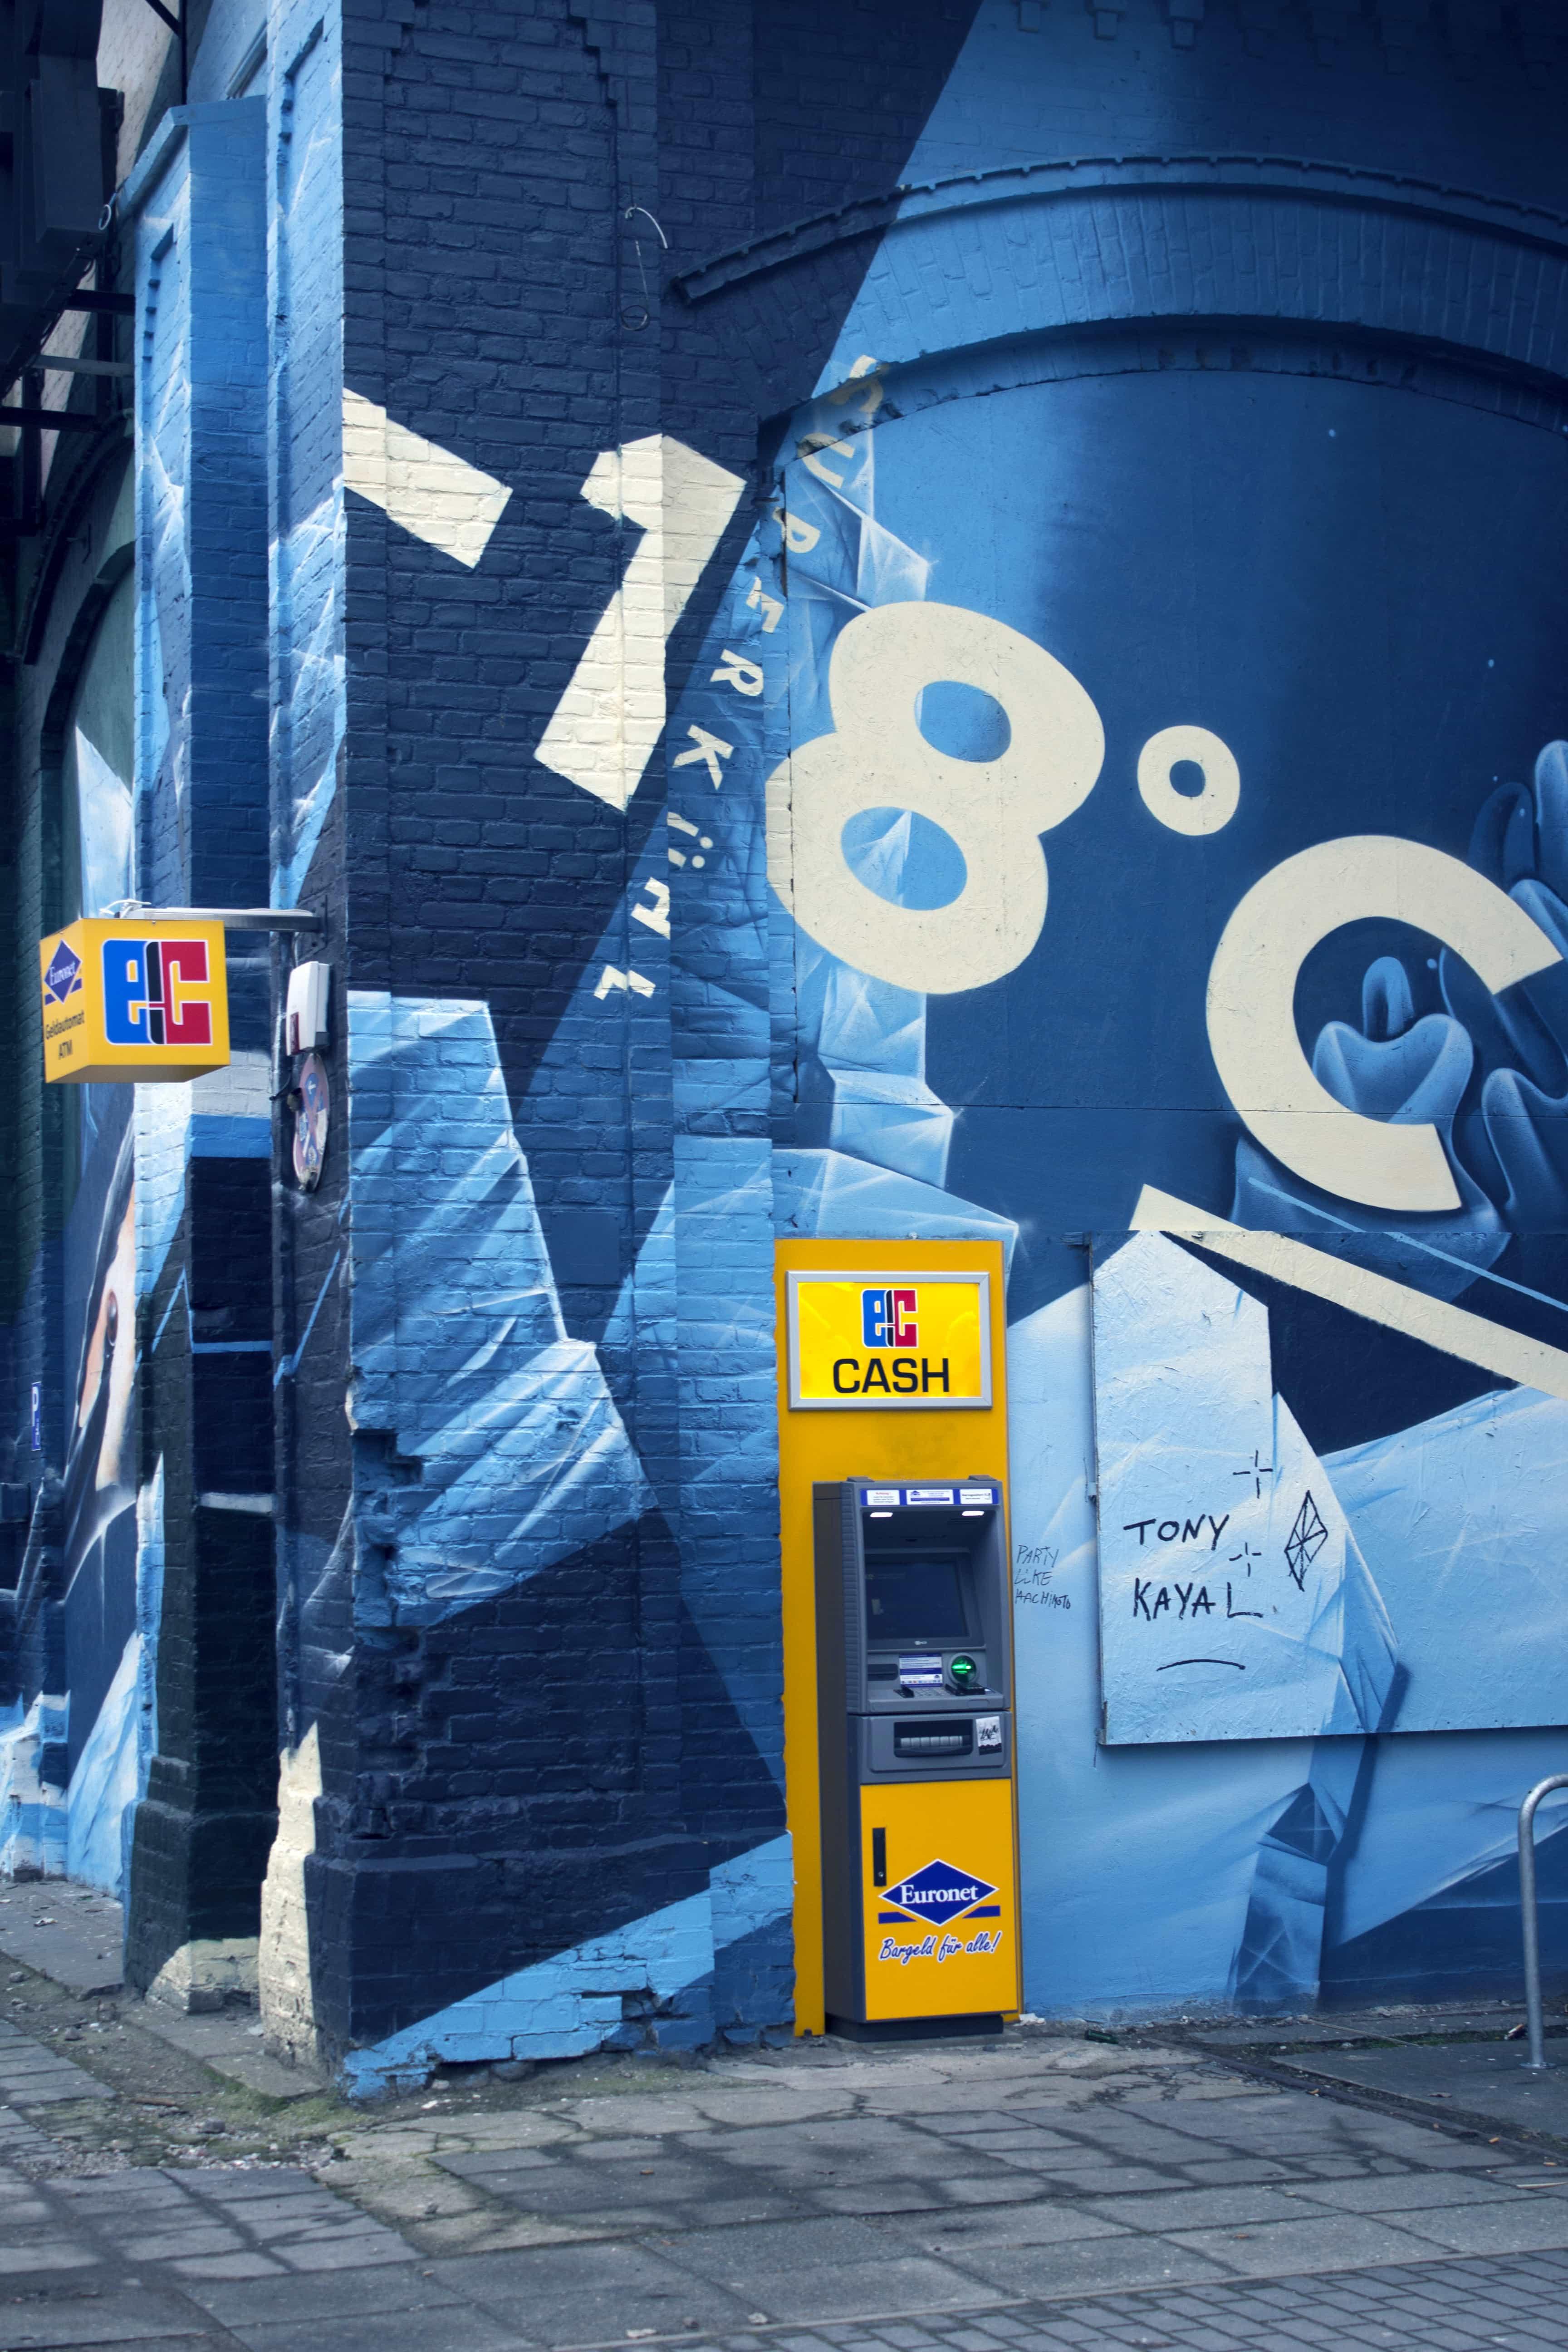 Pinautomaat, wall art, blue, blue-yellow